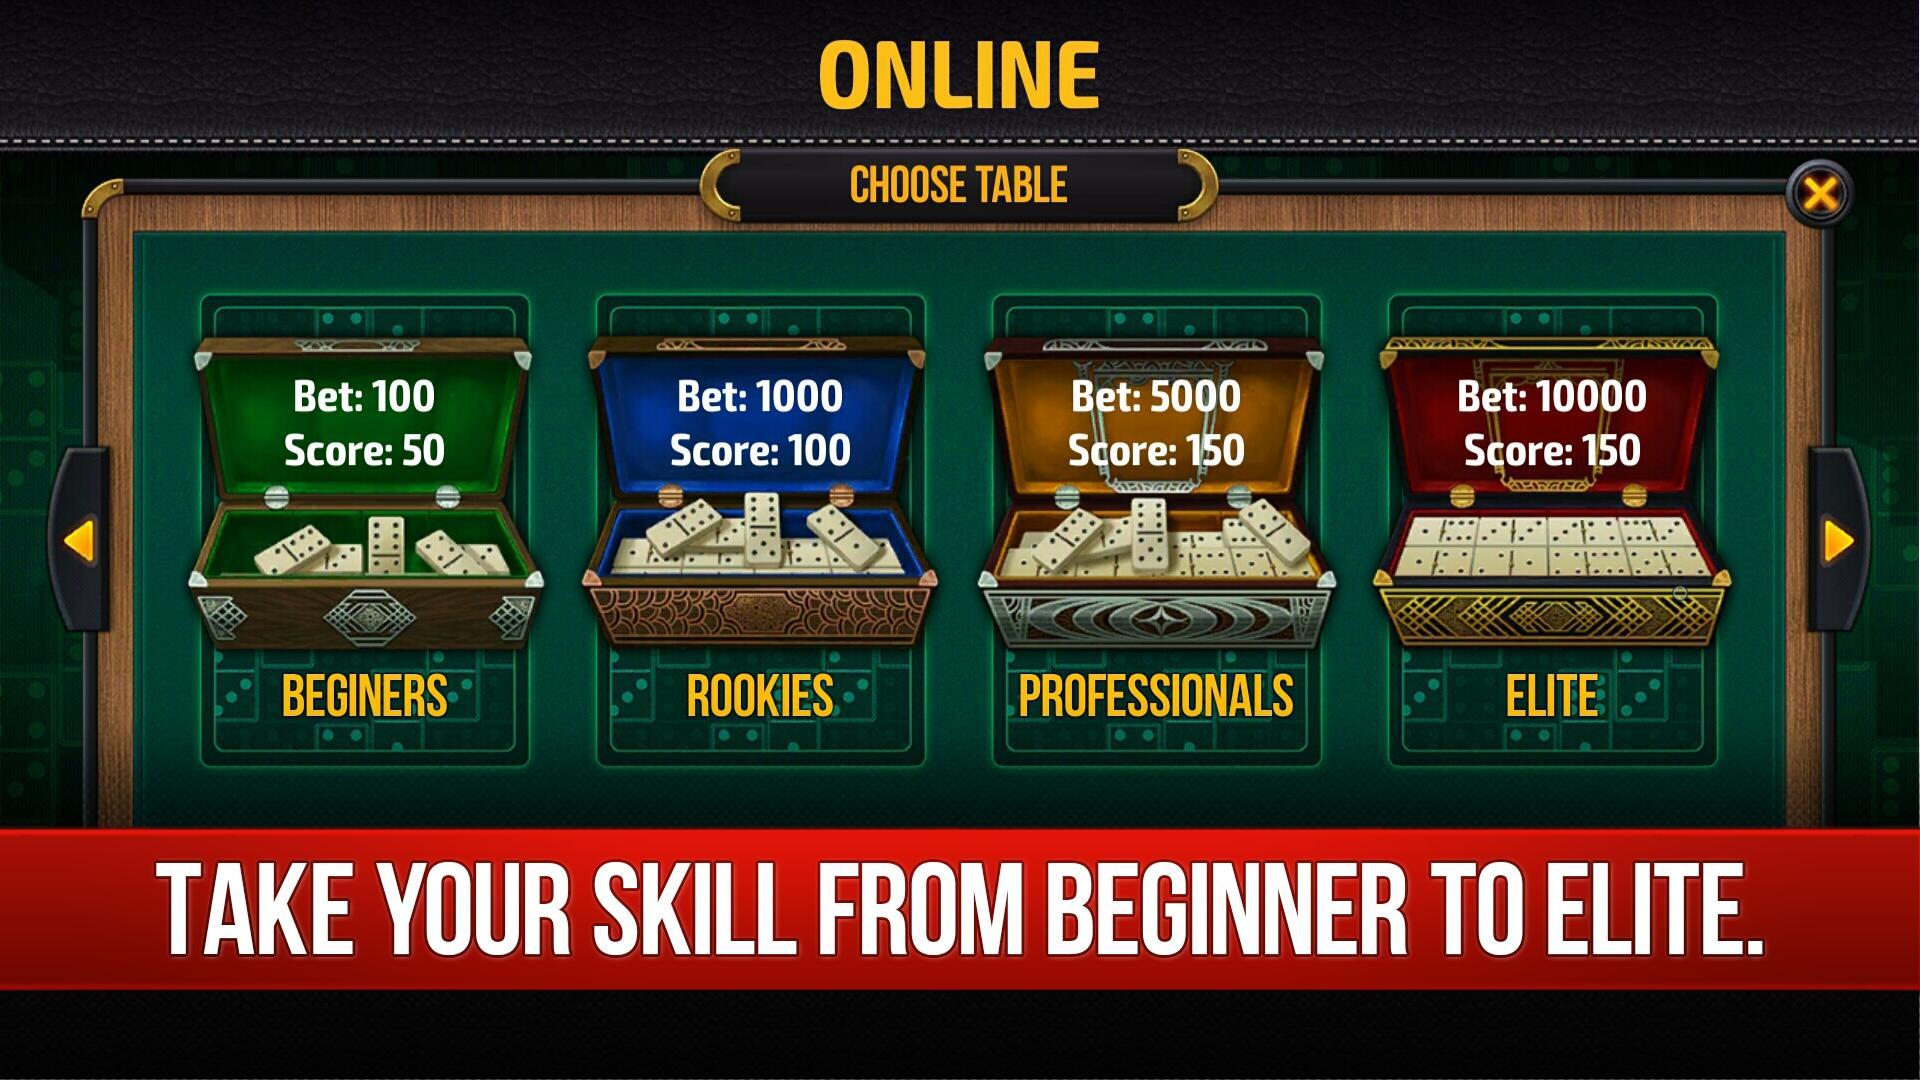 Domino - Dominoes online. Play free Dominos! 2.9.2 Screenshot 10